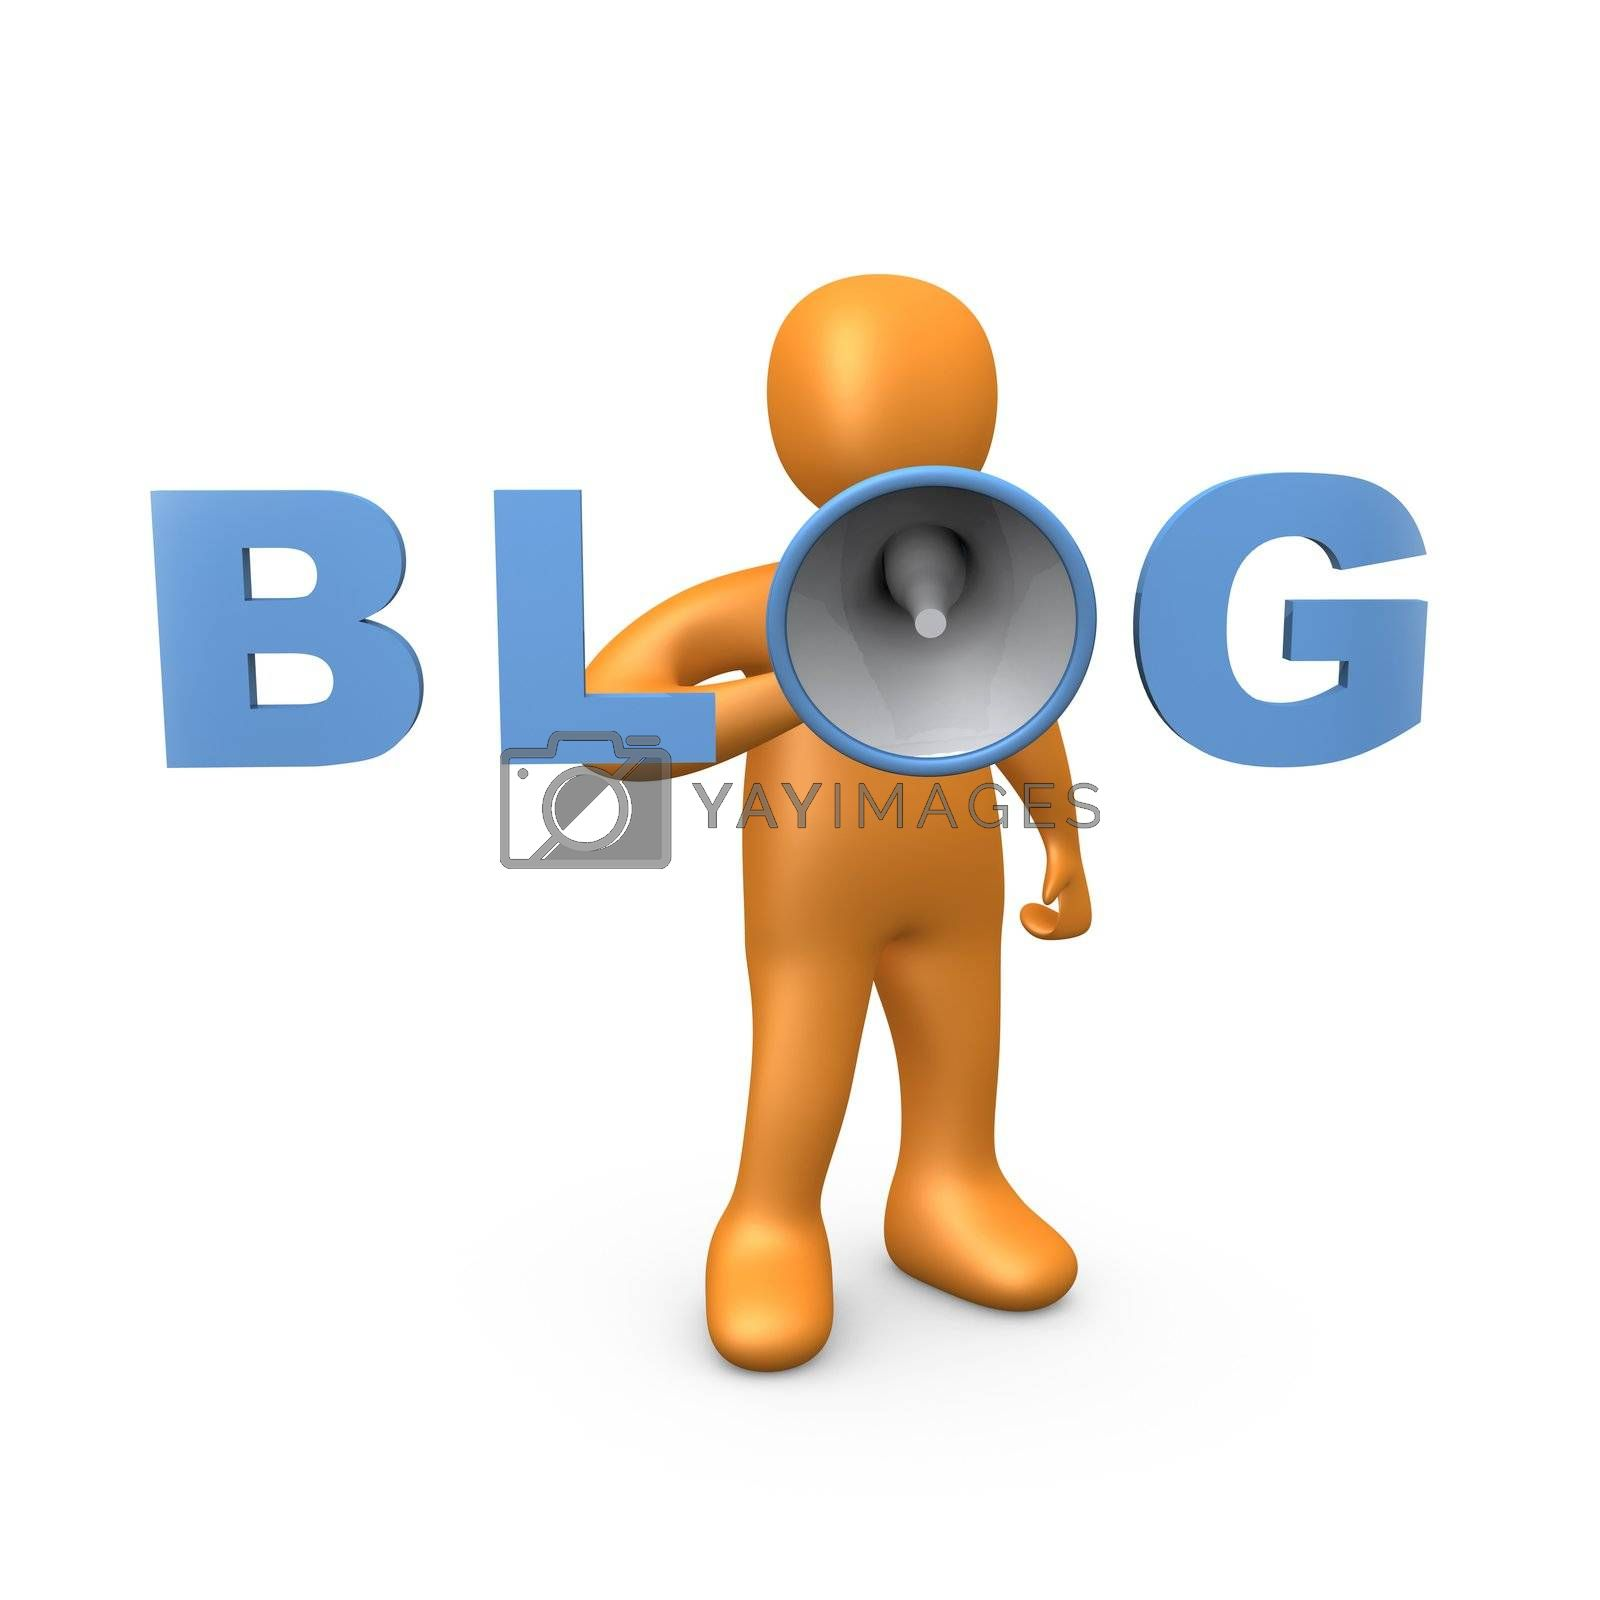 Blog by 3pod